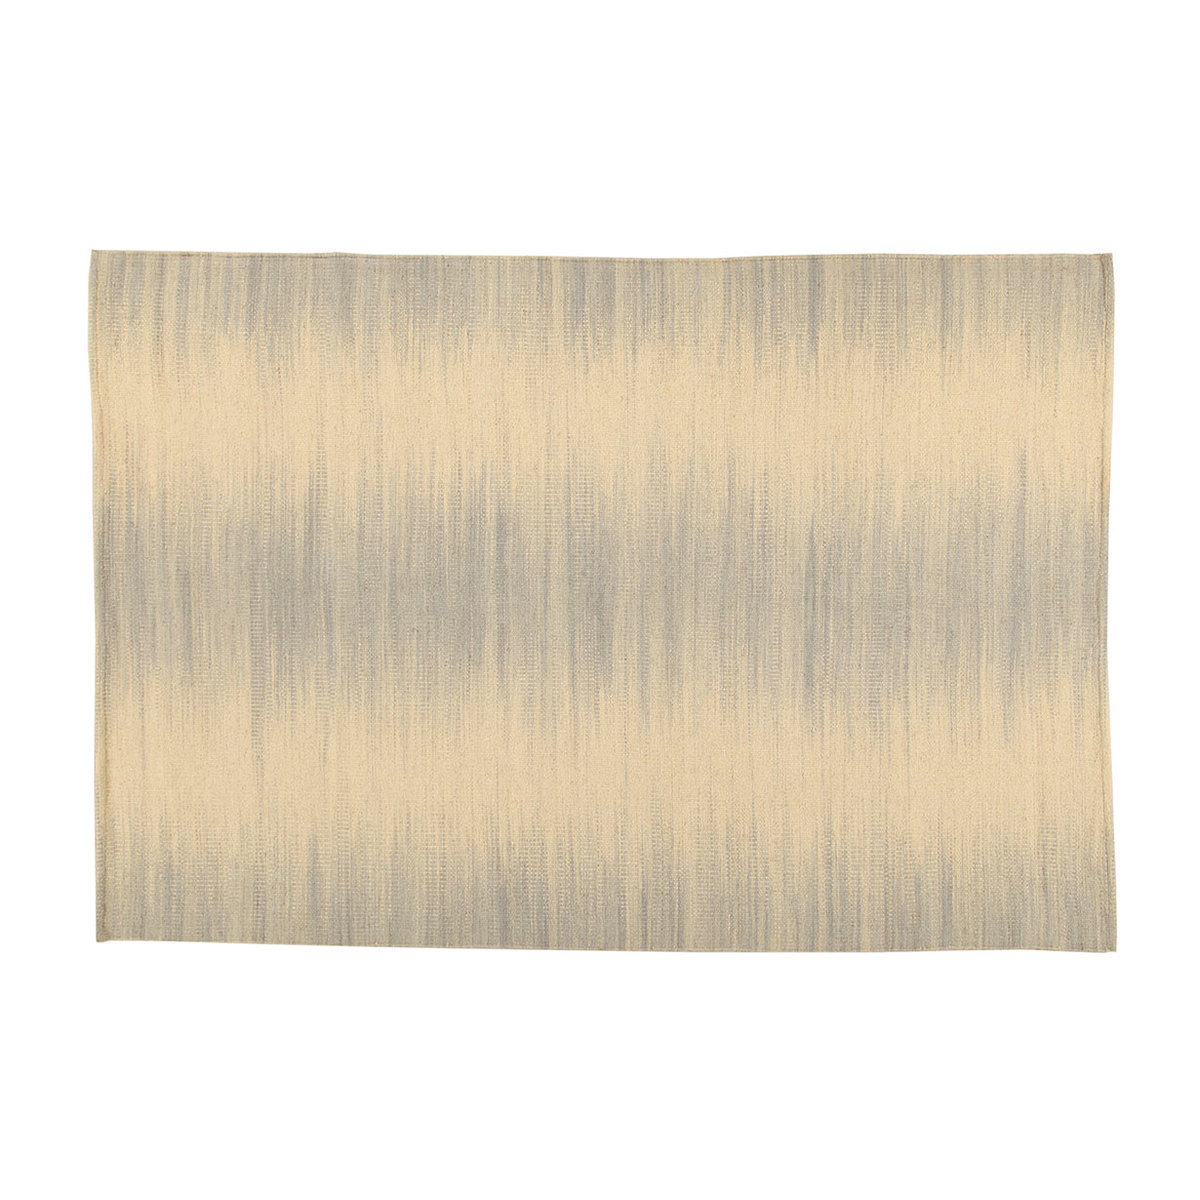 Tappeto ikat kilim 200x300 cm by jalal lovethesign - Tappeto 200x300 ...